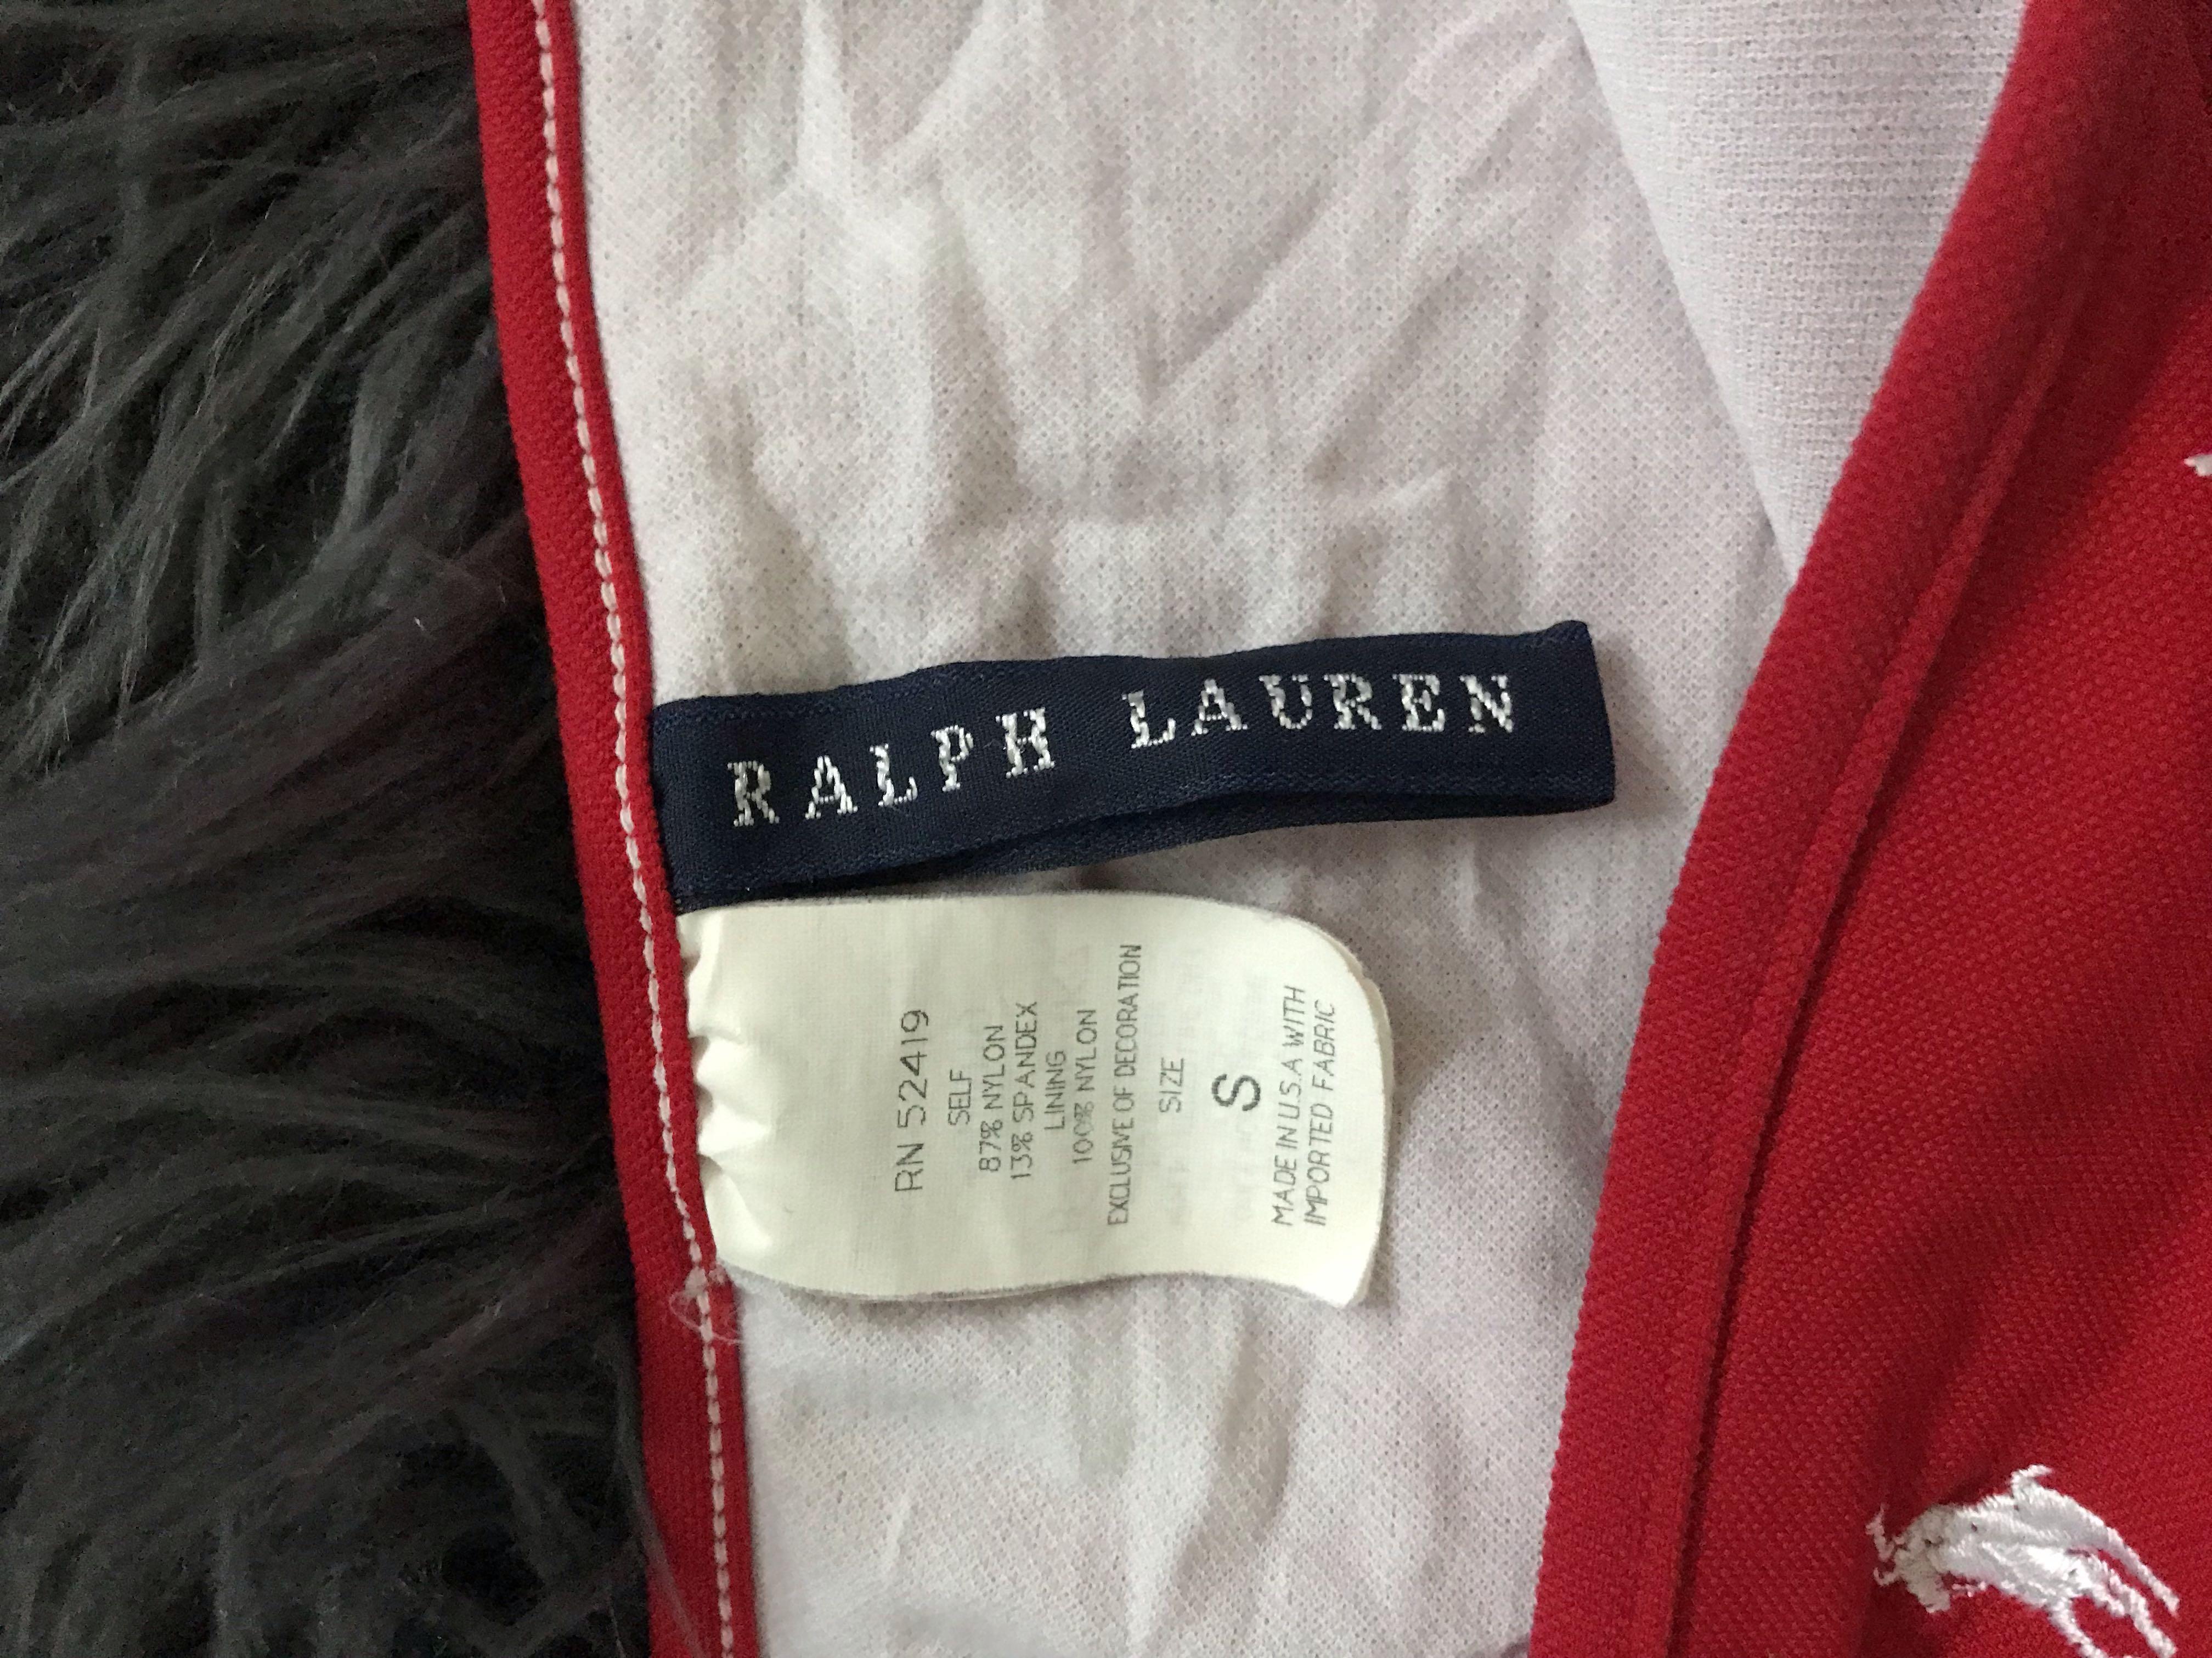 Ralph Lauren bikini bottoms